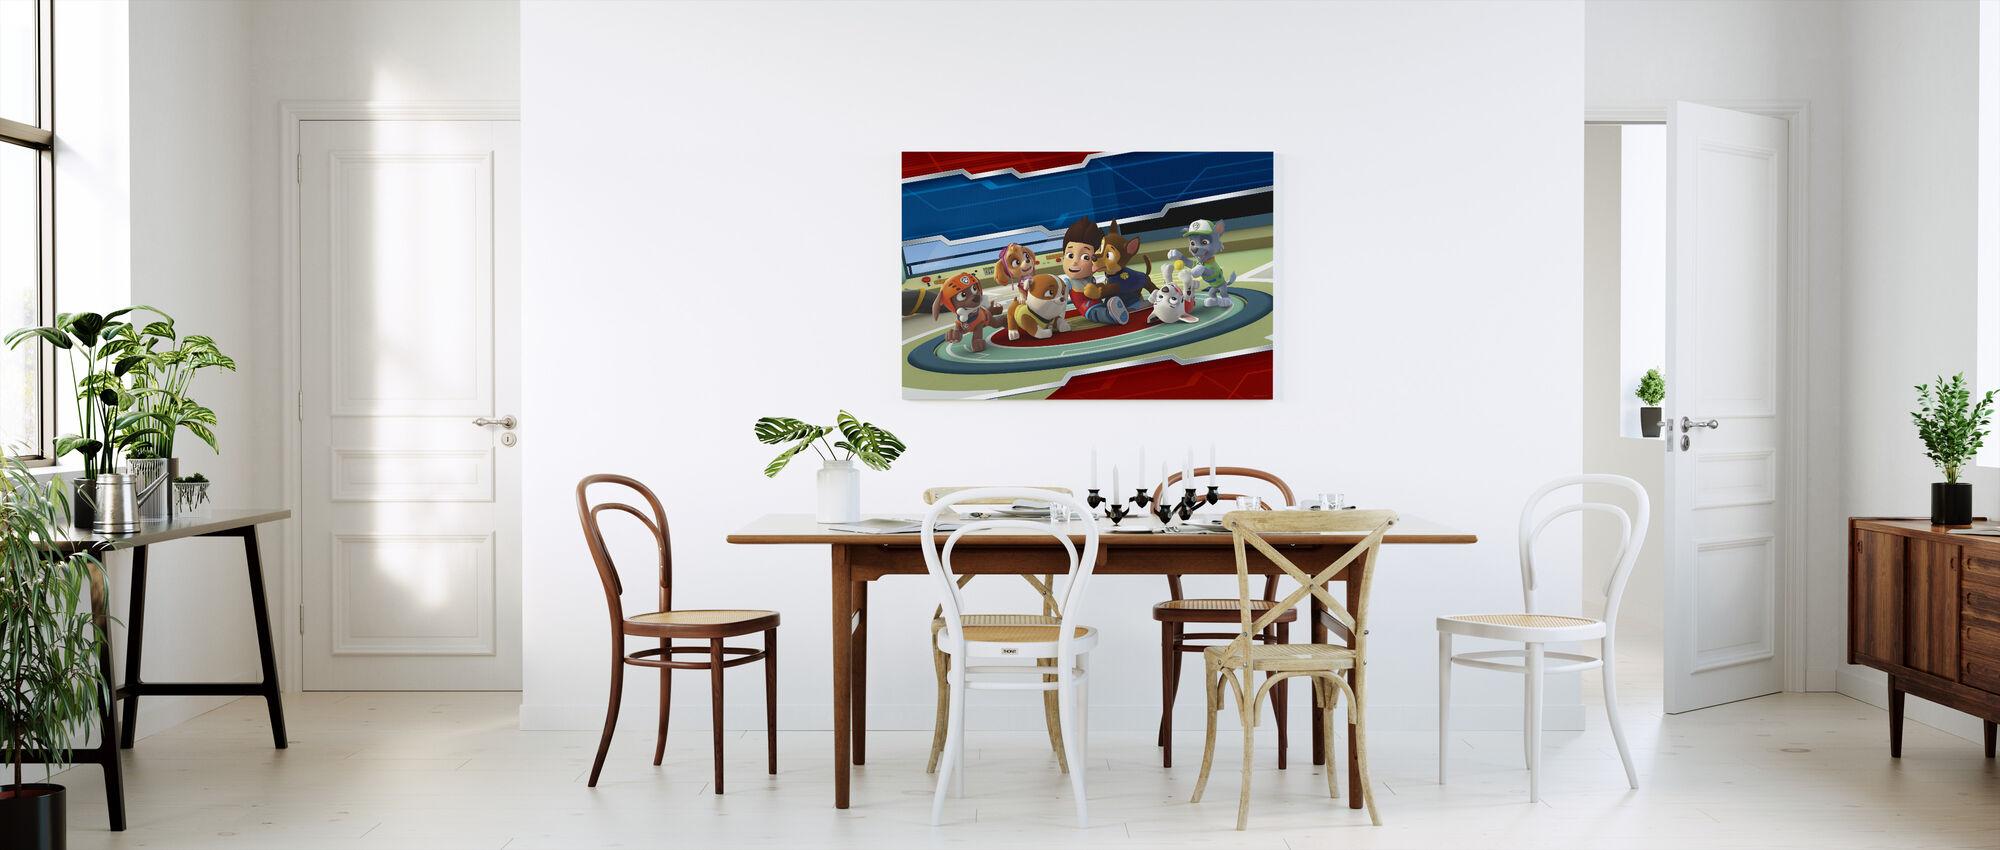 PAW Patrol - Alle poten op dek - Canvas print - Keuken